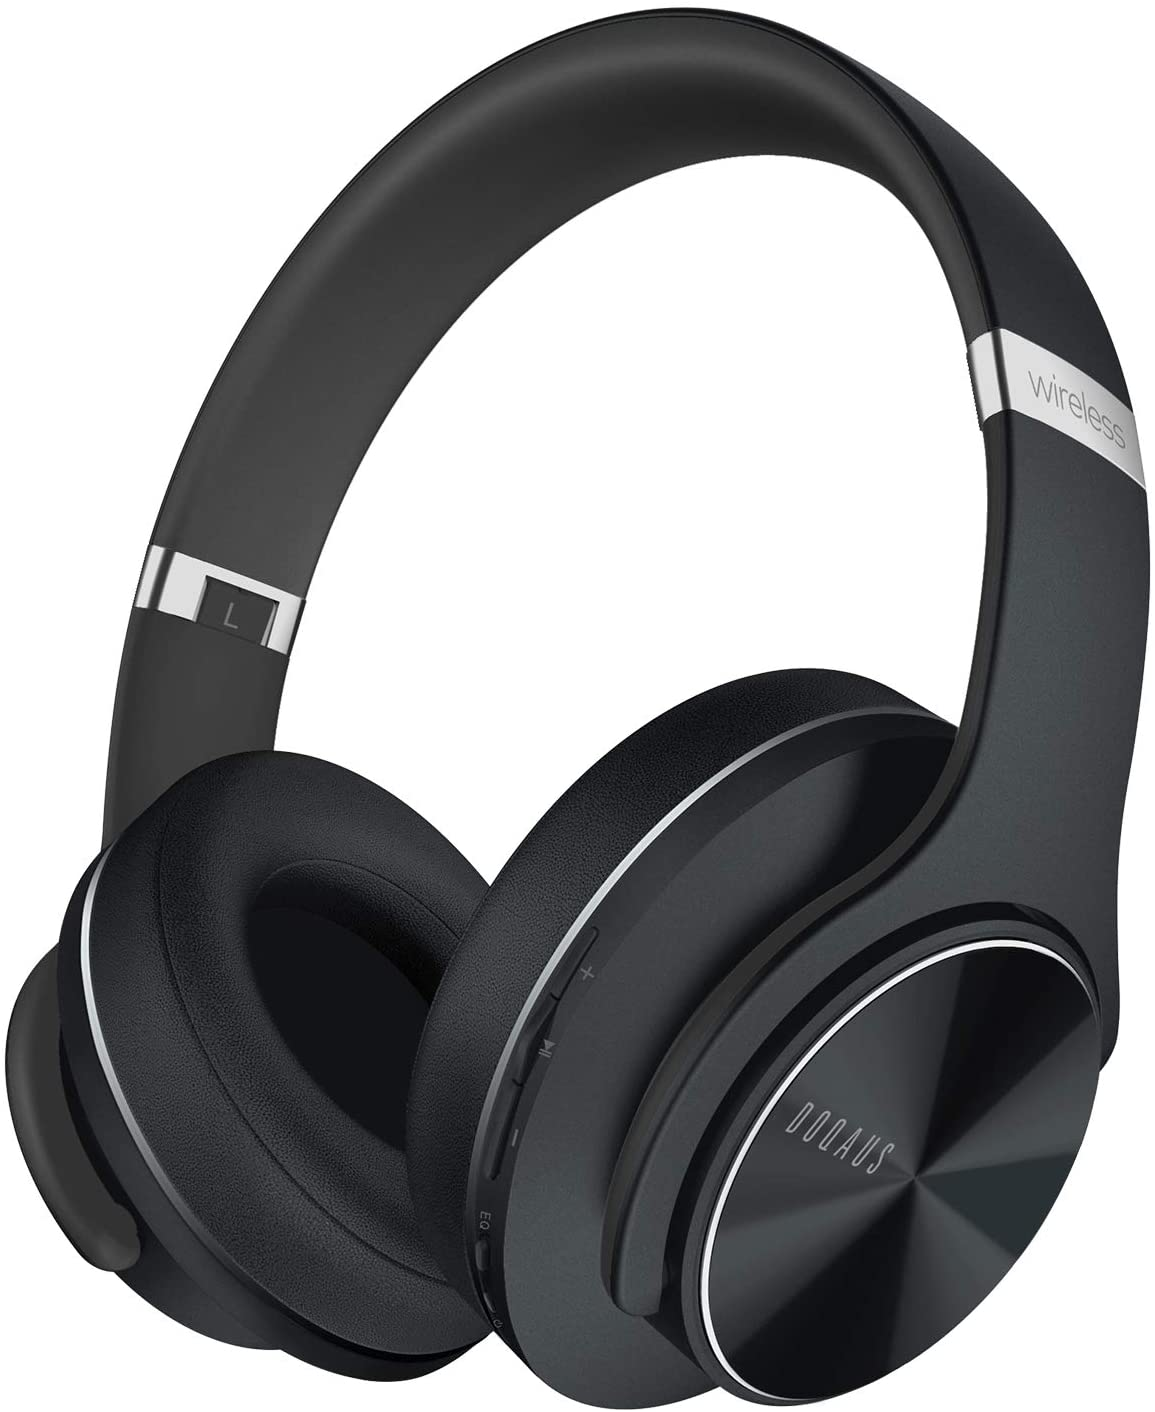 Bluetooth wireless headphones DOQAUS CARE 1